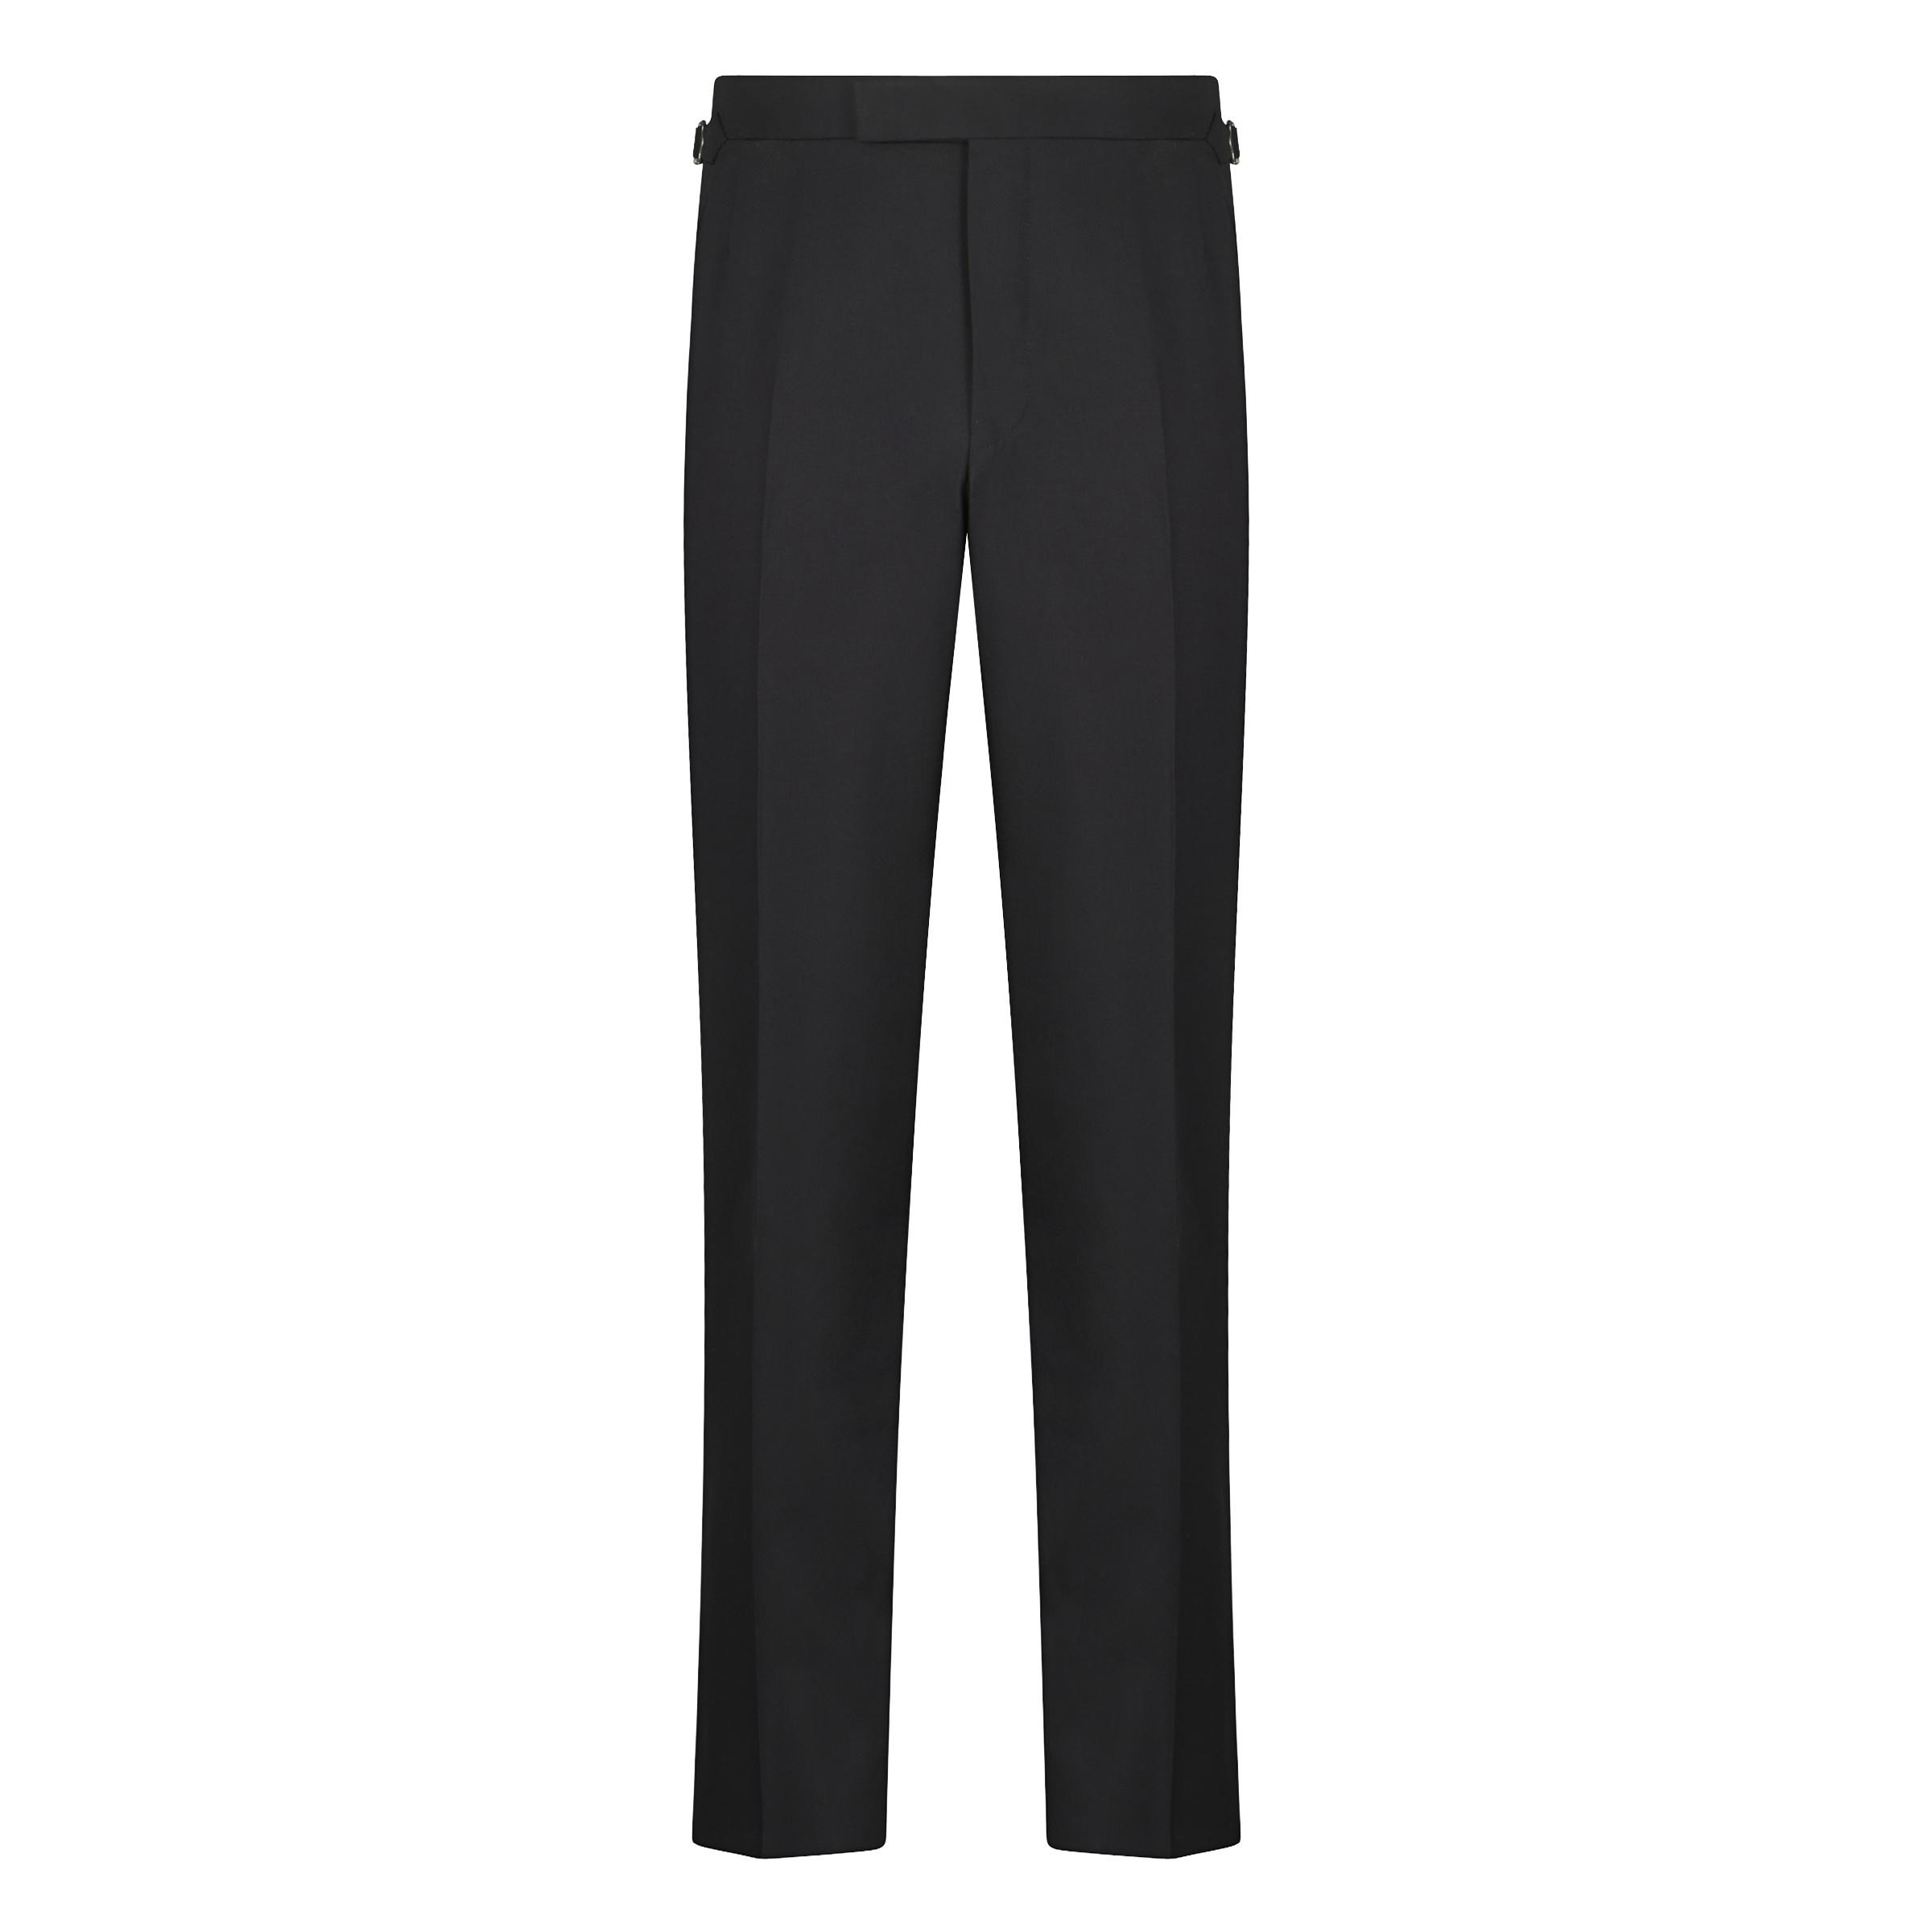 Black Linen Contemporary Trousers